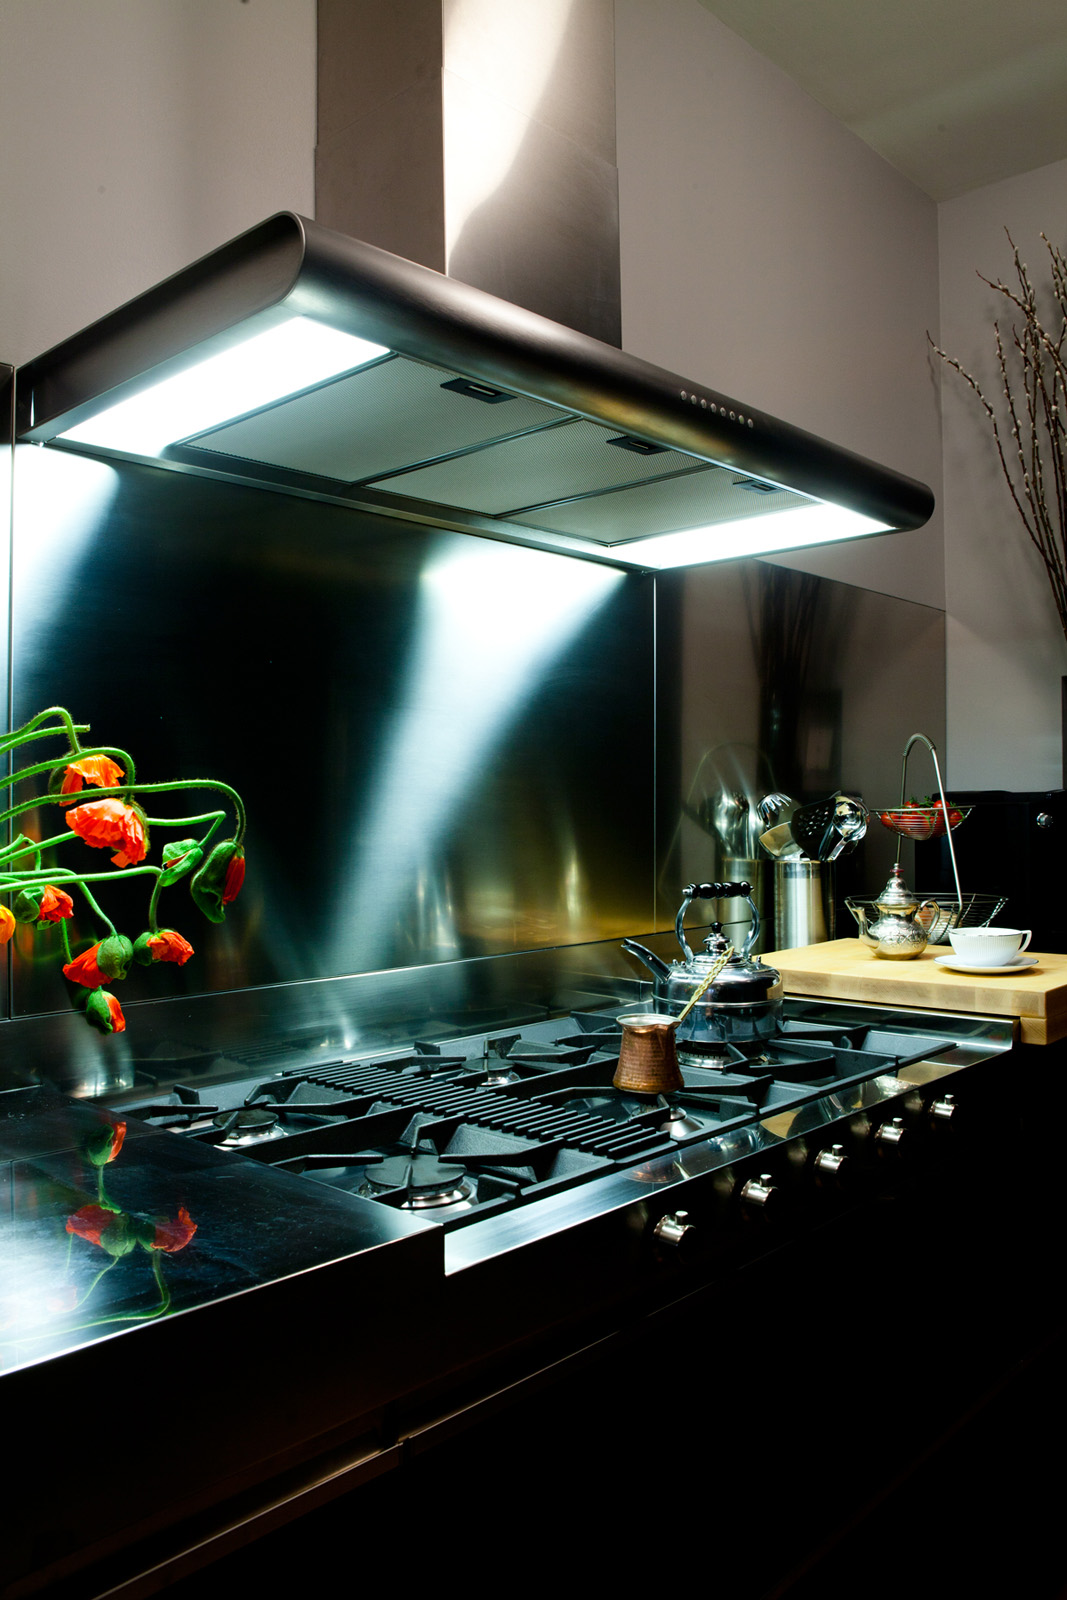 dramov kitchen range